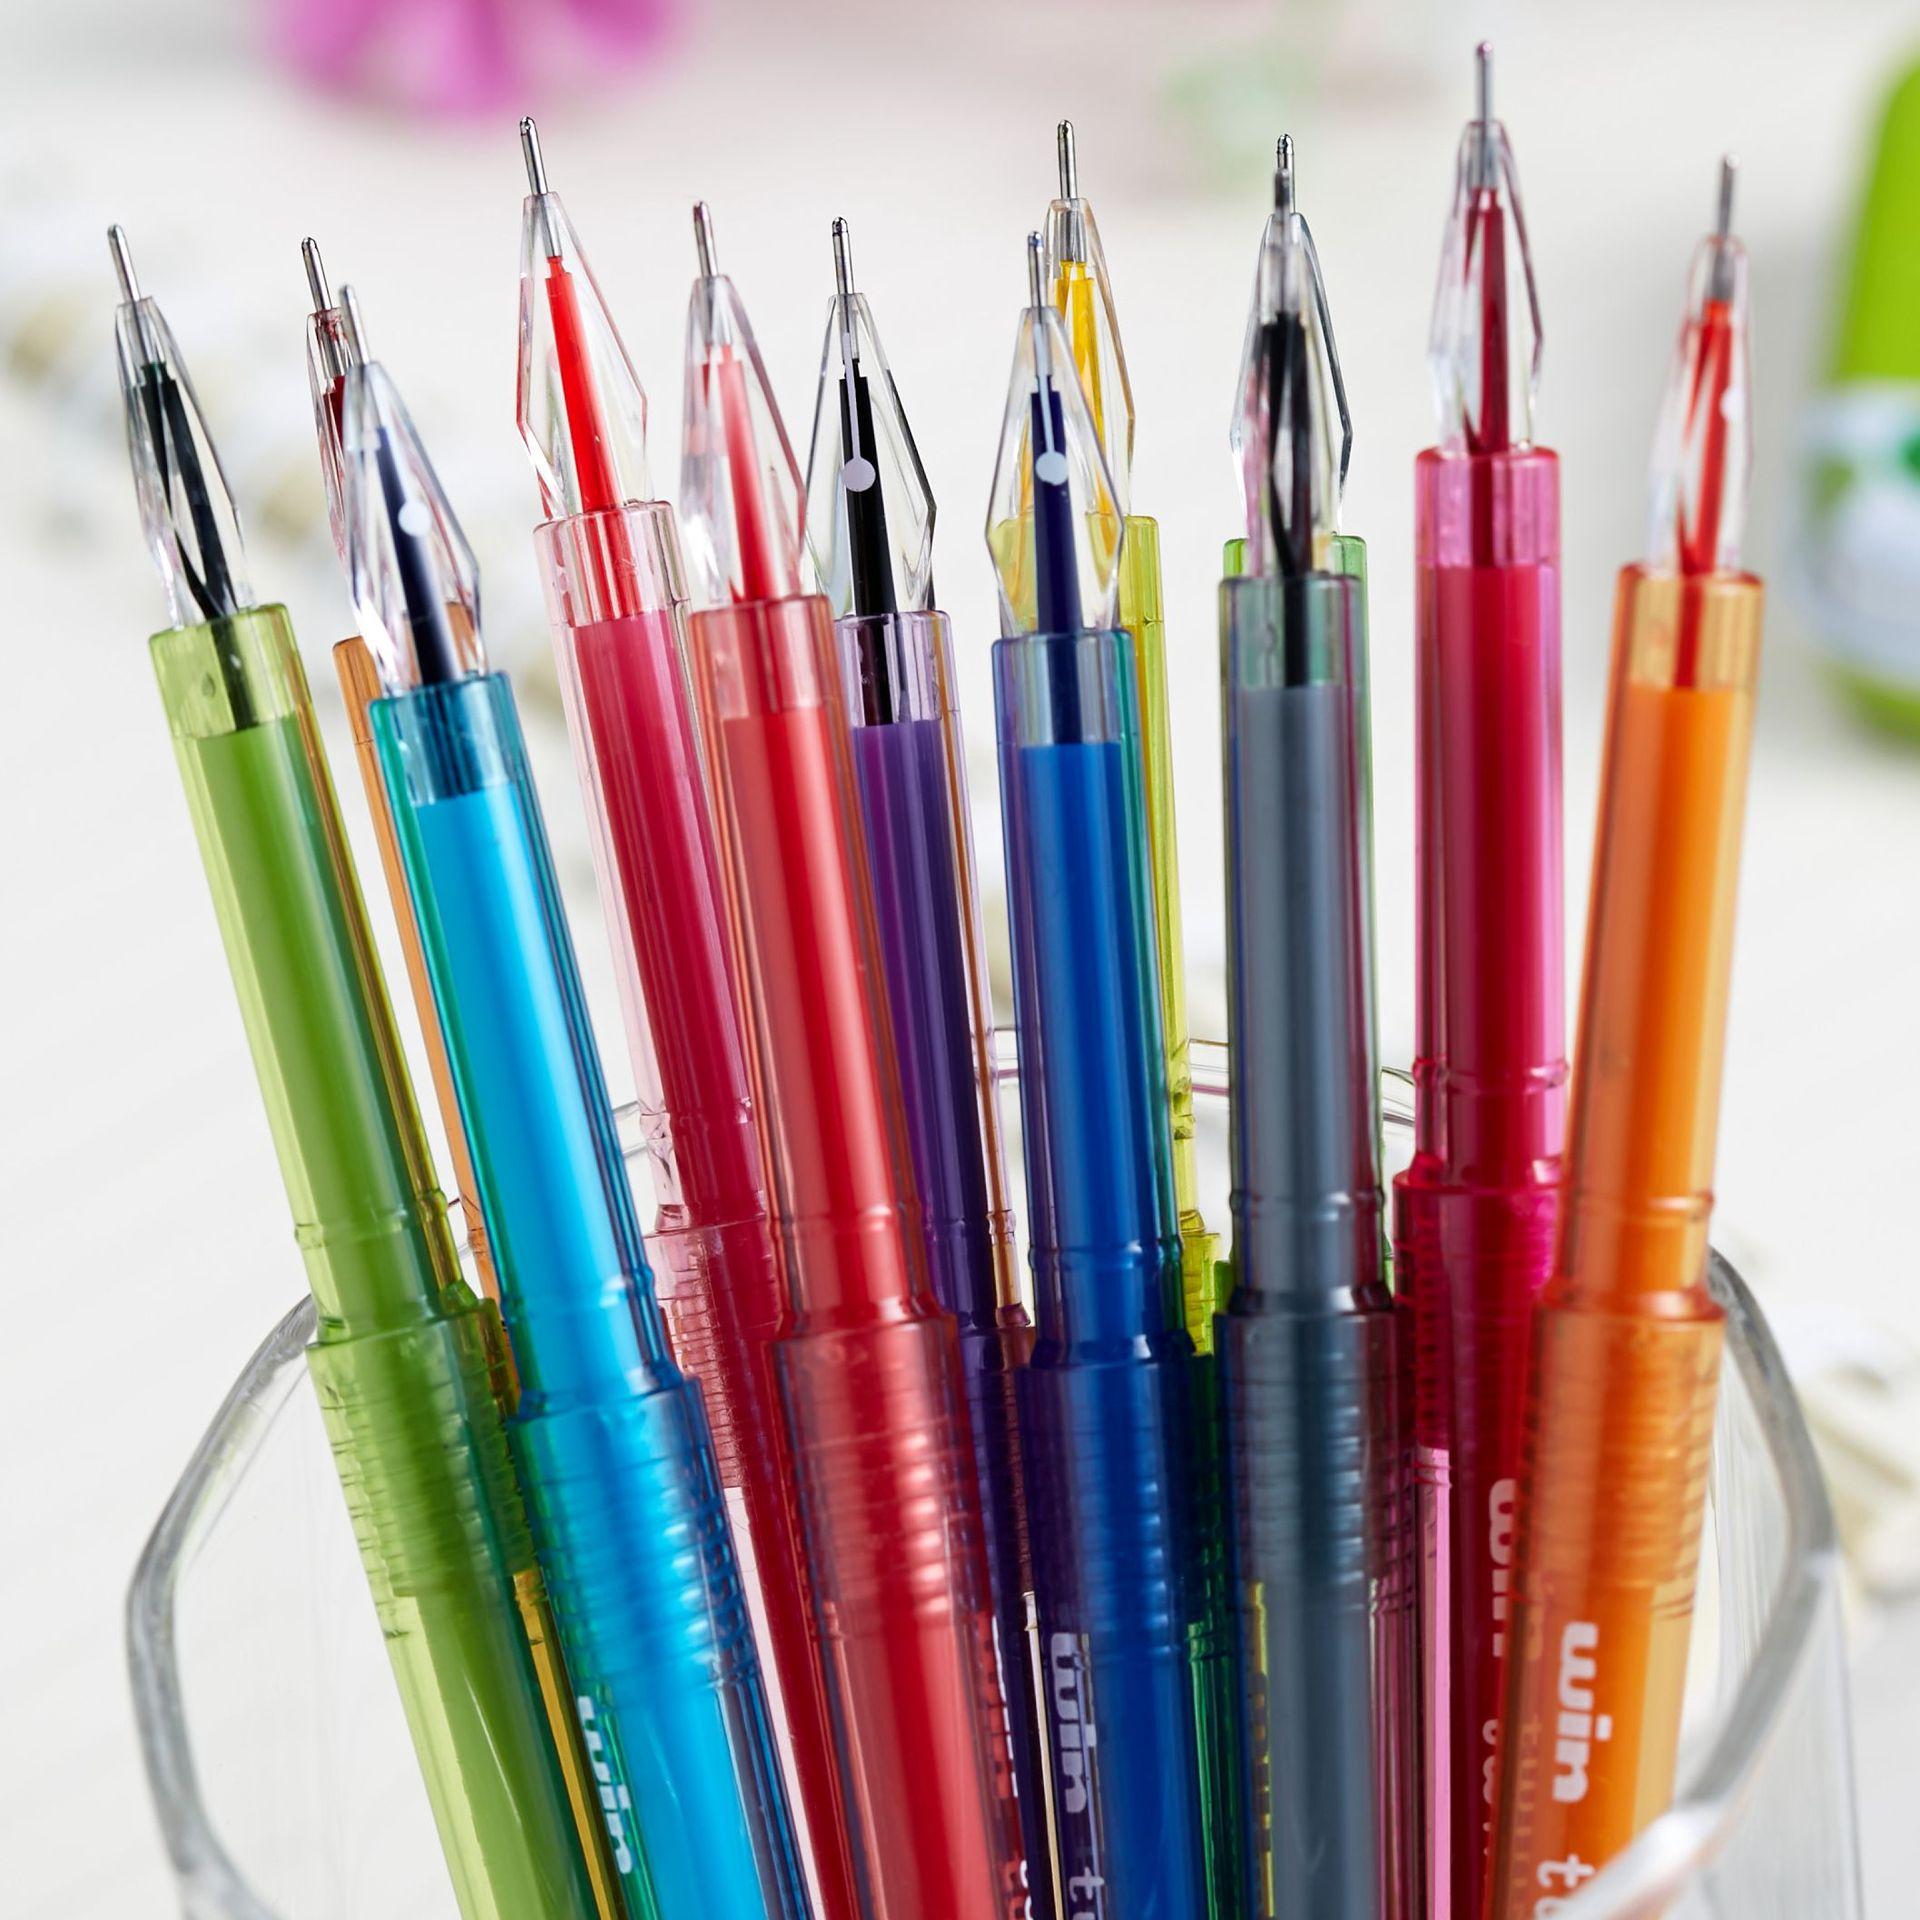 (12Pcs/Set) 0.5 Diamond Pens Gel Pen School Supplies Colored Gel Pens Kawaii School Supplies Office School Cute Pen Stabilo(China (Mainland))